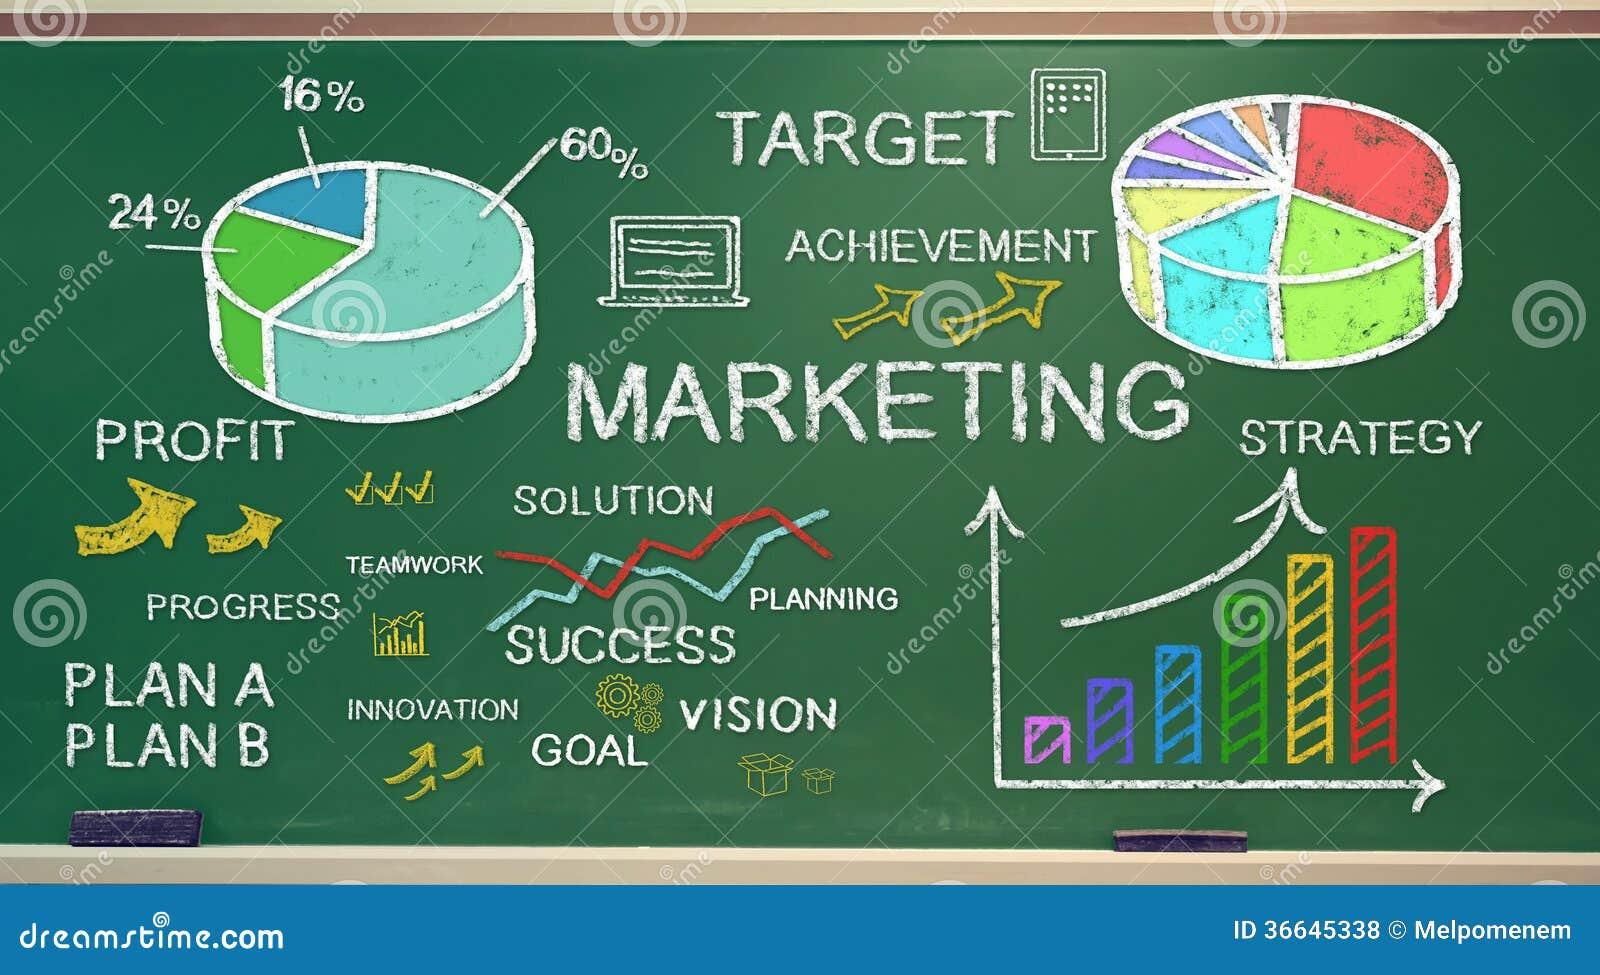 marketing ideas chalk board idea sketching green 36645338 Top Result 20 Best Of Free Marketing Ideas Gallery 2017 Kqk9